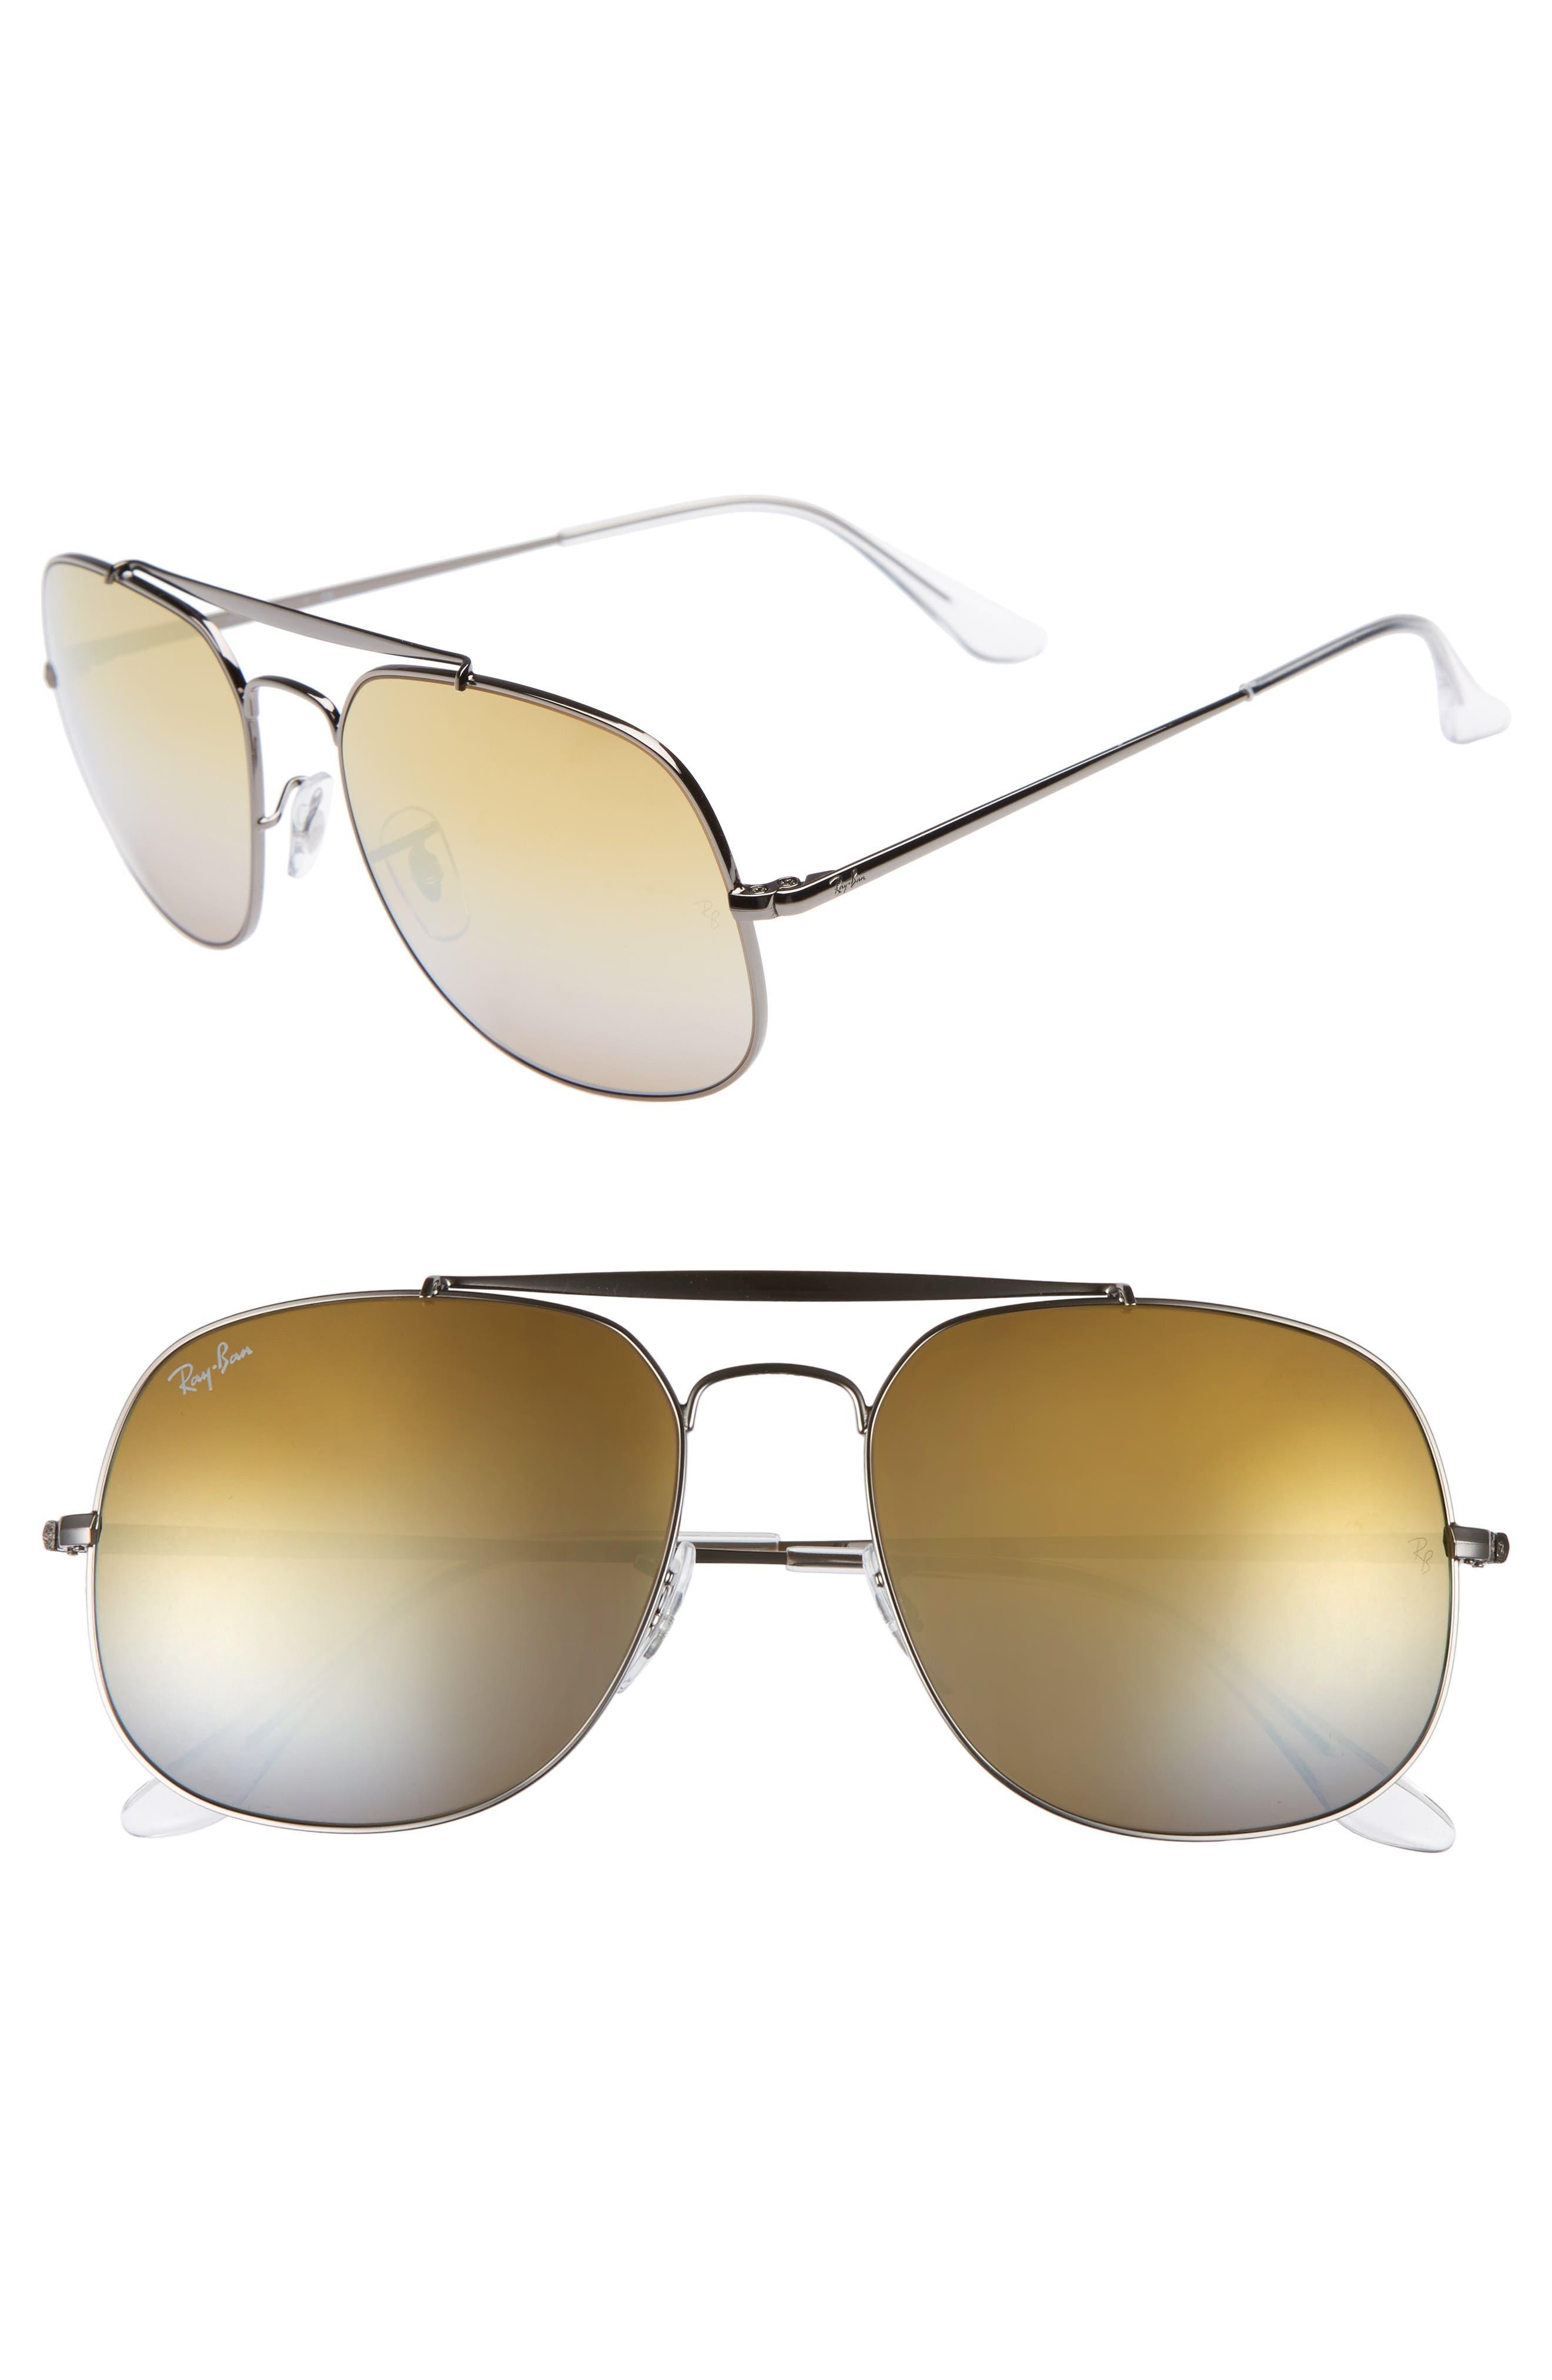 Ray-Ban The General 57mm Aviator Sunglasses